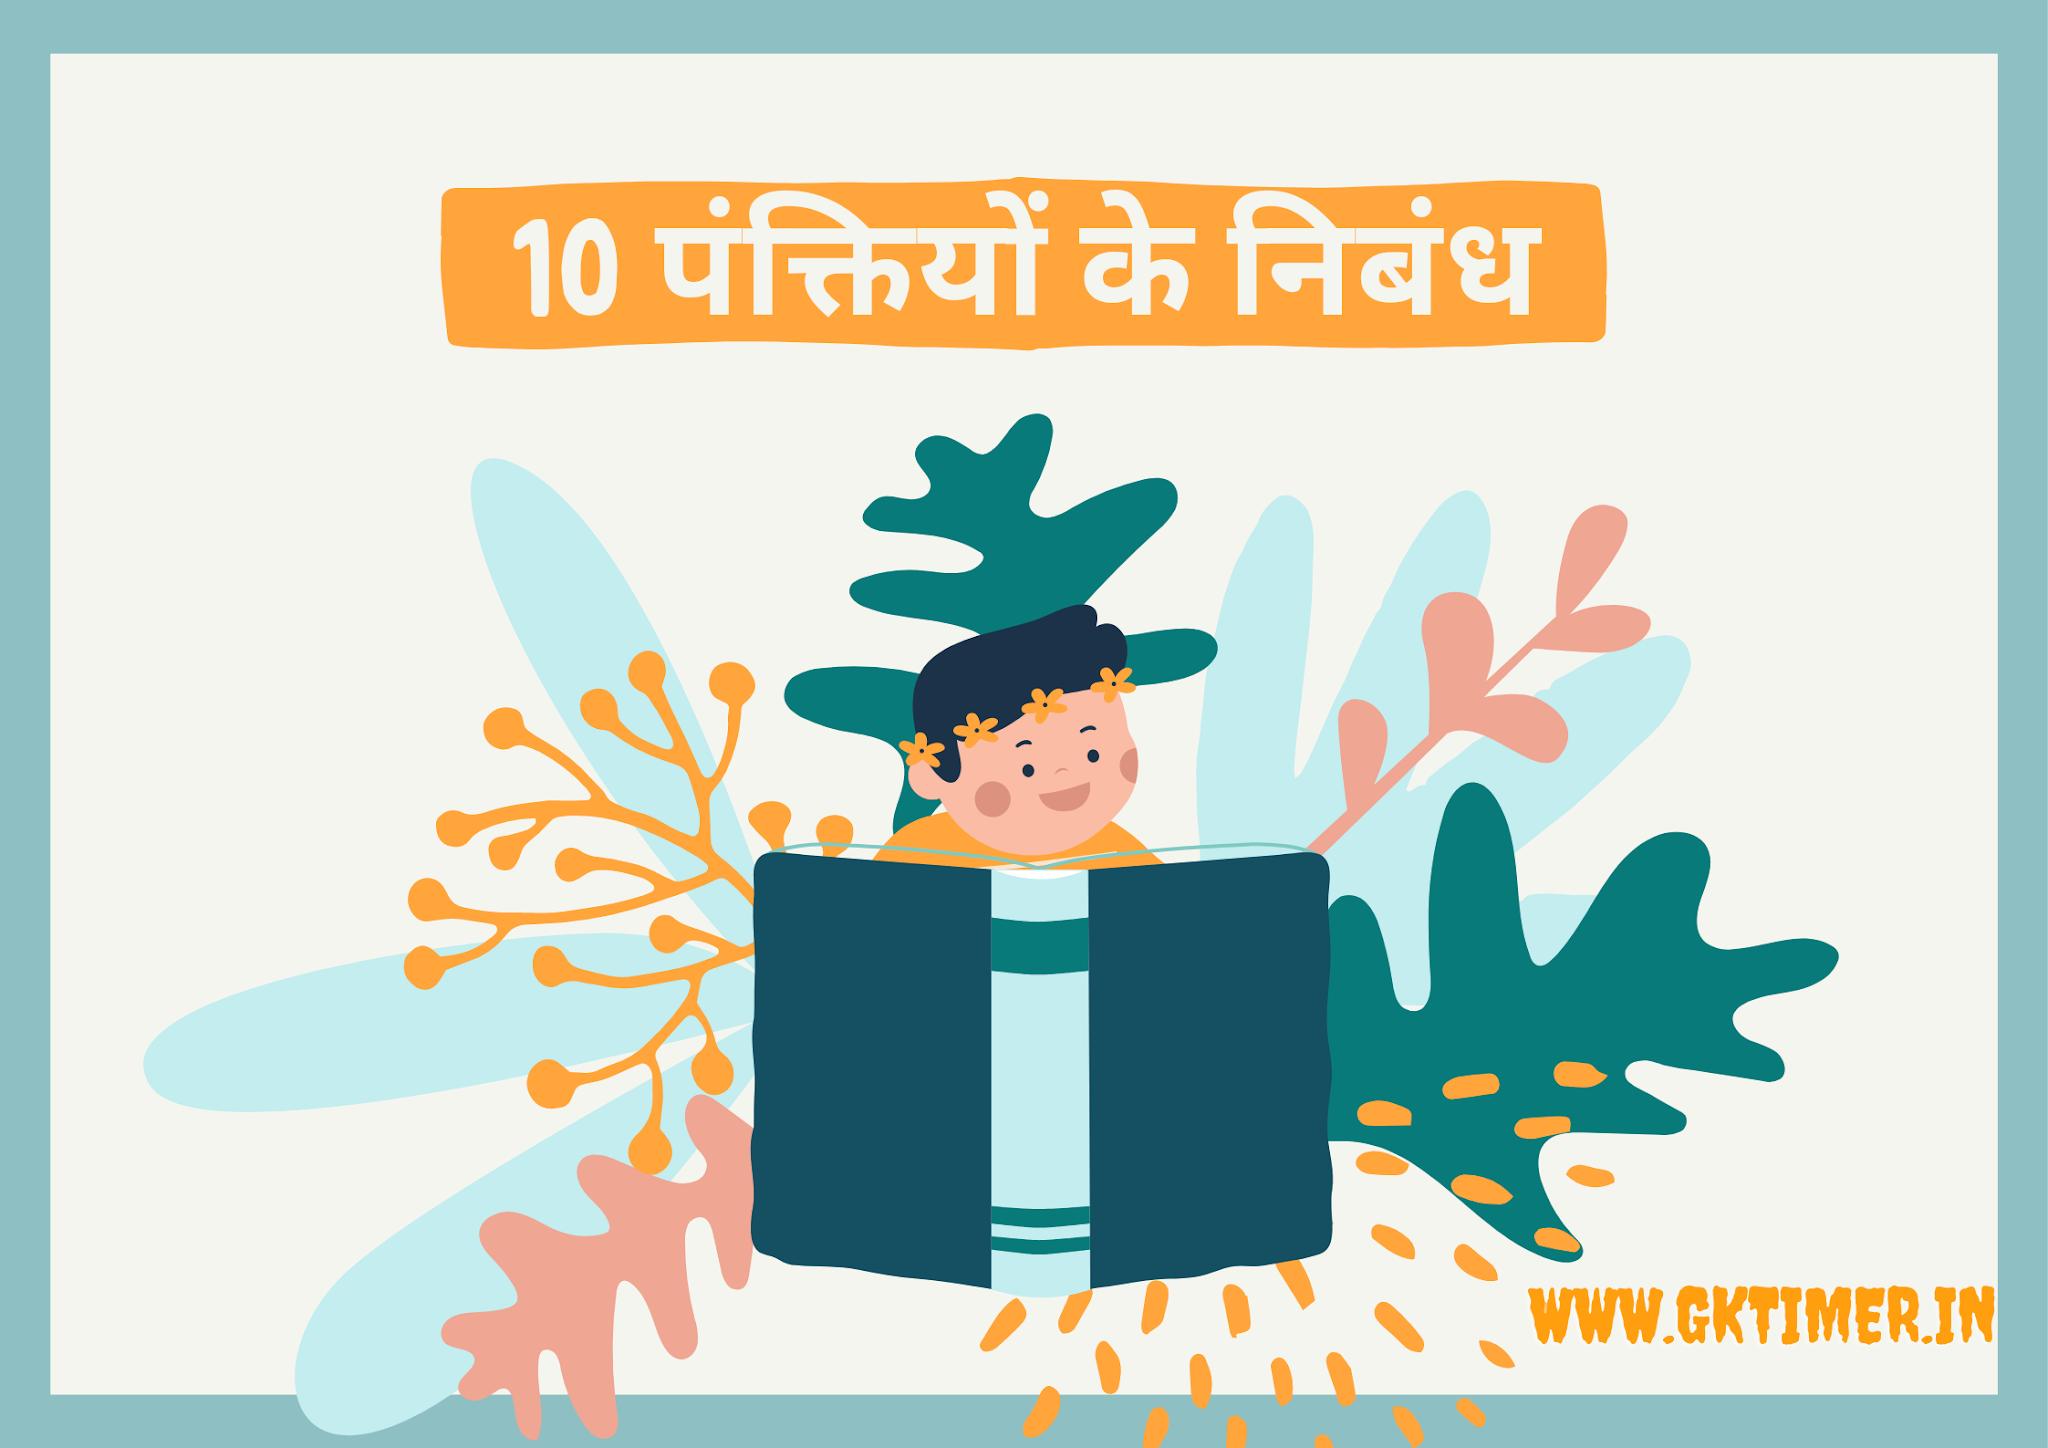 10 पंक्तियों के निबंध   10 Lines Essays for Kids and Students in Hindi